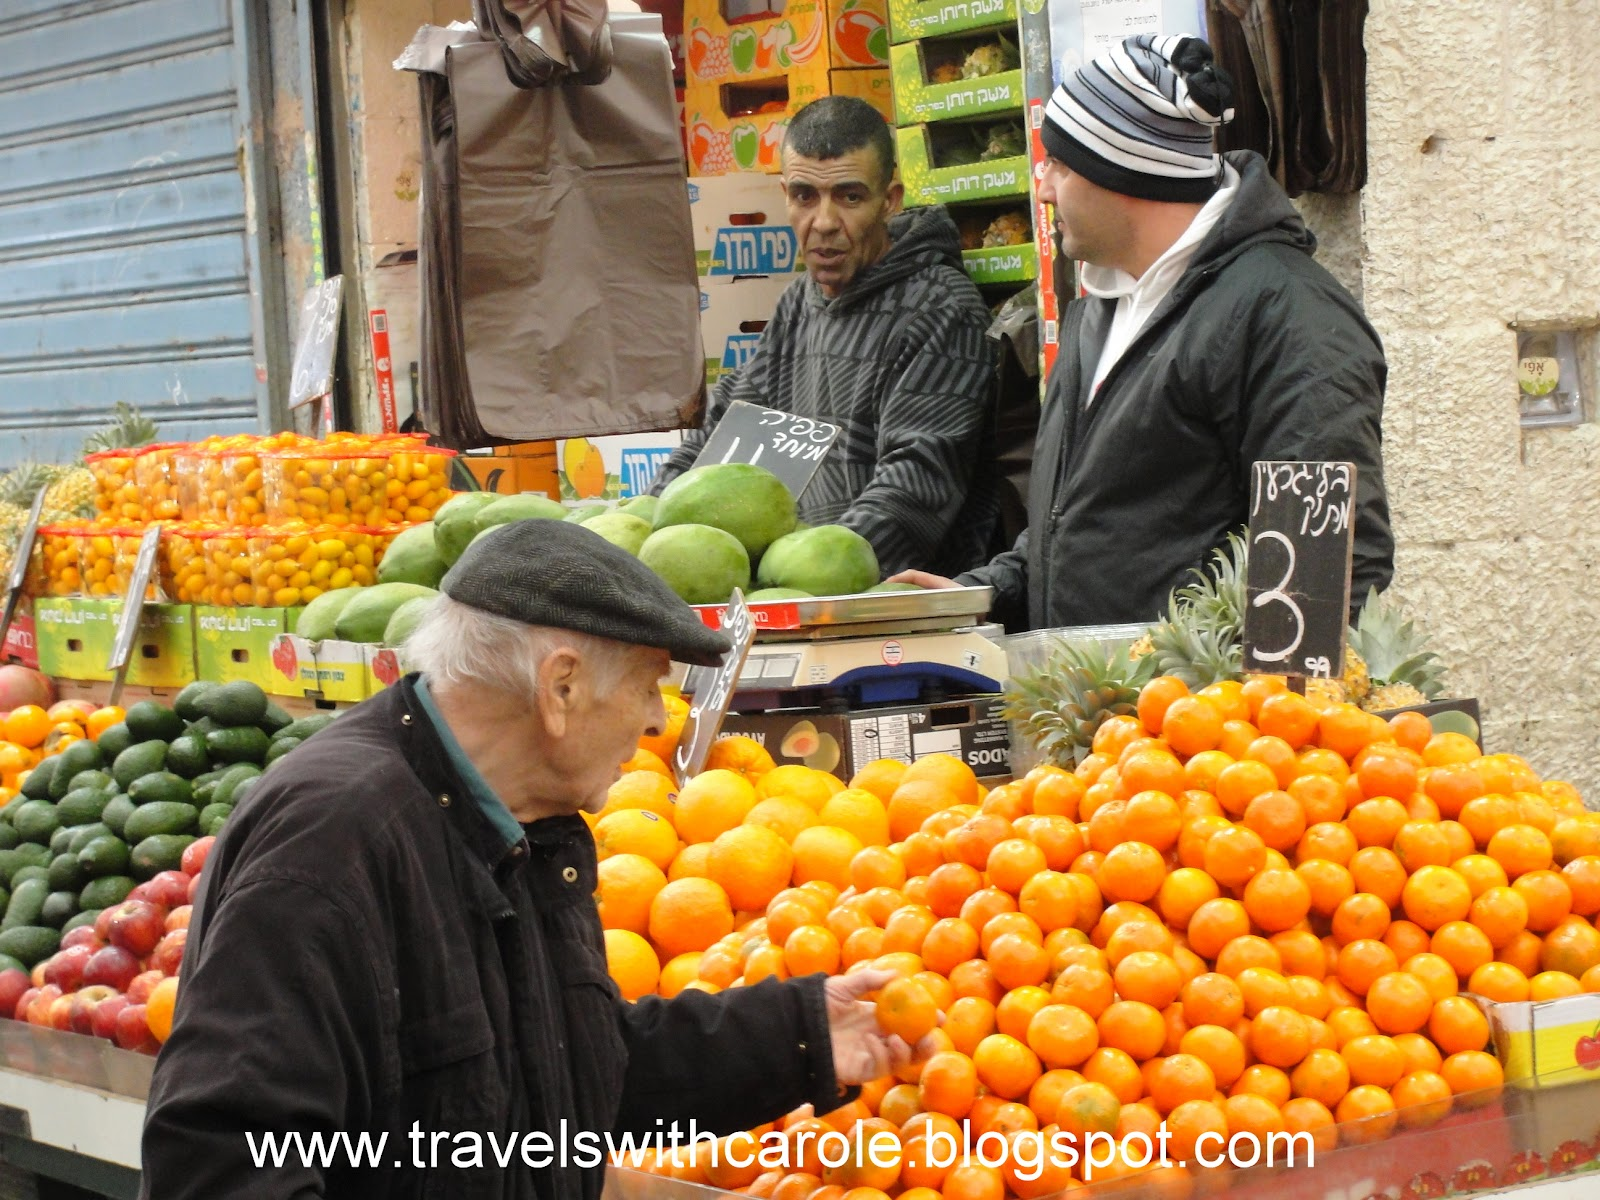 http://1.bp.blogspot.com/-paC8v9z6xSc/T4yYxt1wgVI/AAAAAAAACoQ/MIP0OJzh3ak/s1600/ISRAEL-Jerusalem-MahaneYehudaMarket13(c2011CaroleTerwilligerMeyers)-watermark.JPG